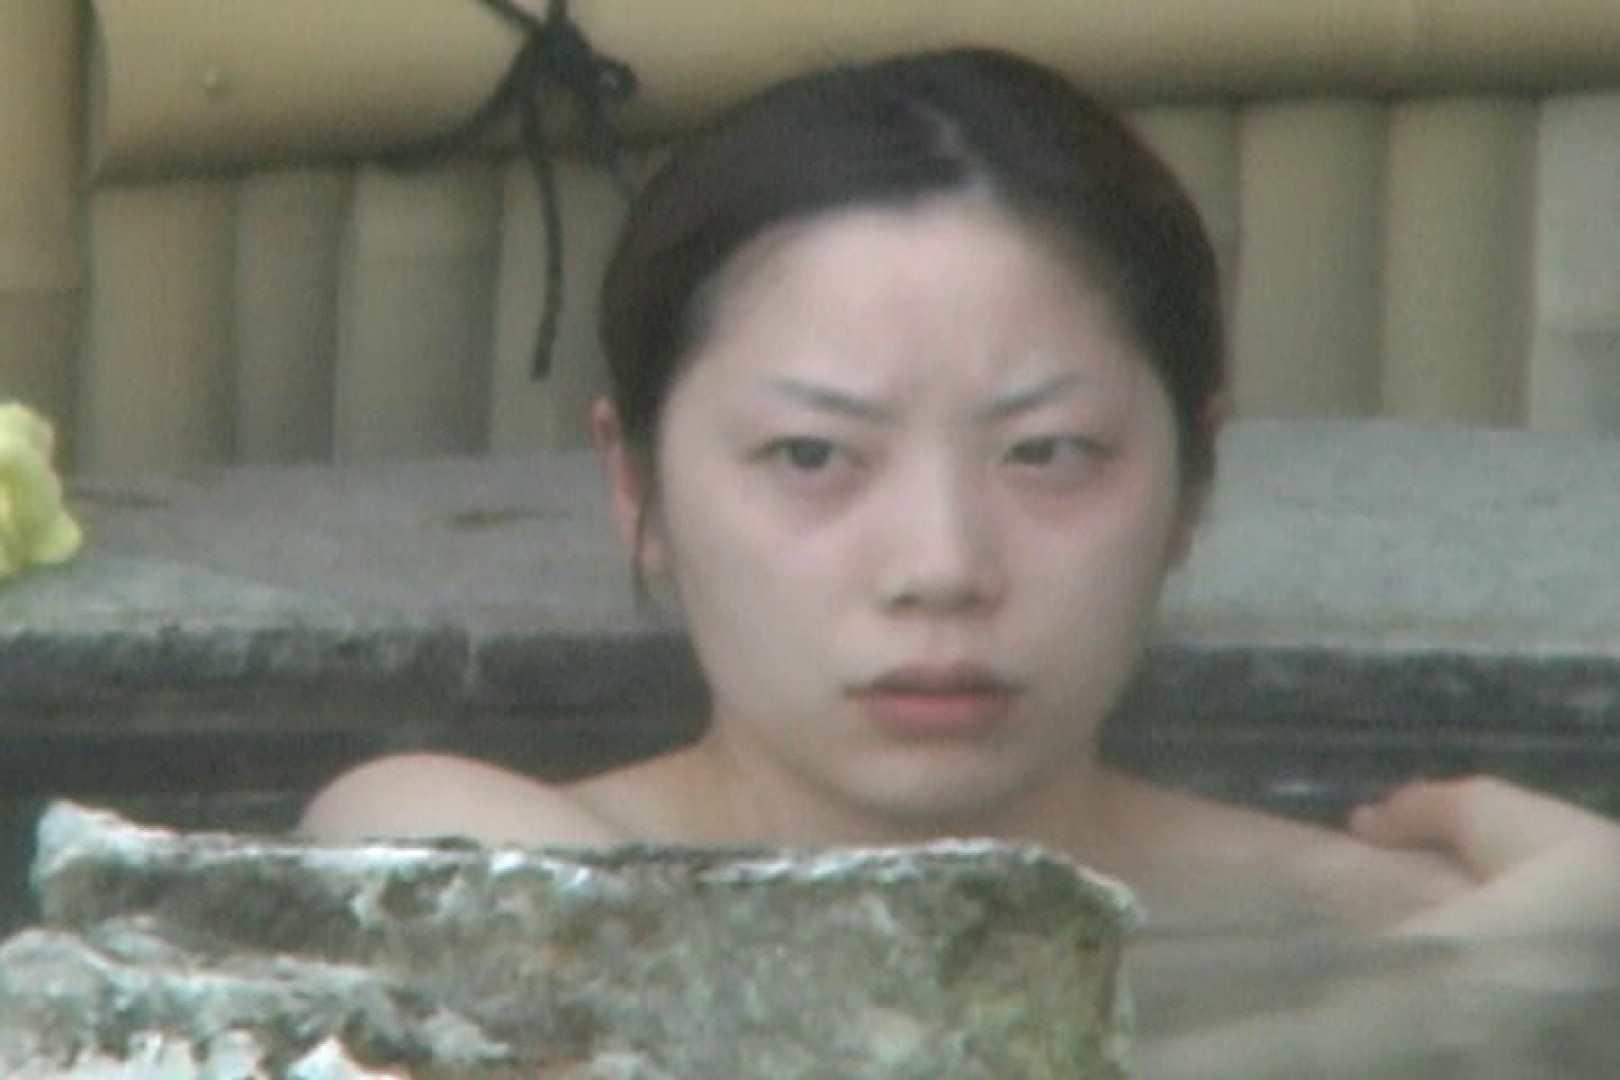 Aquaな露天風呂Vol.596 OLセックス  77画像 6